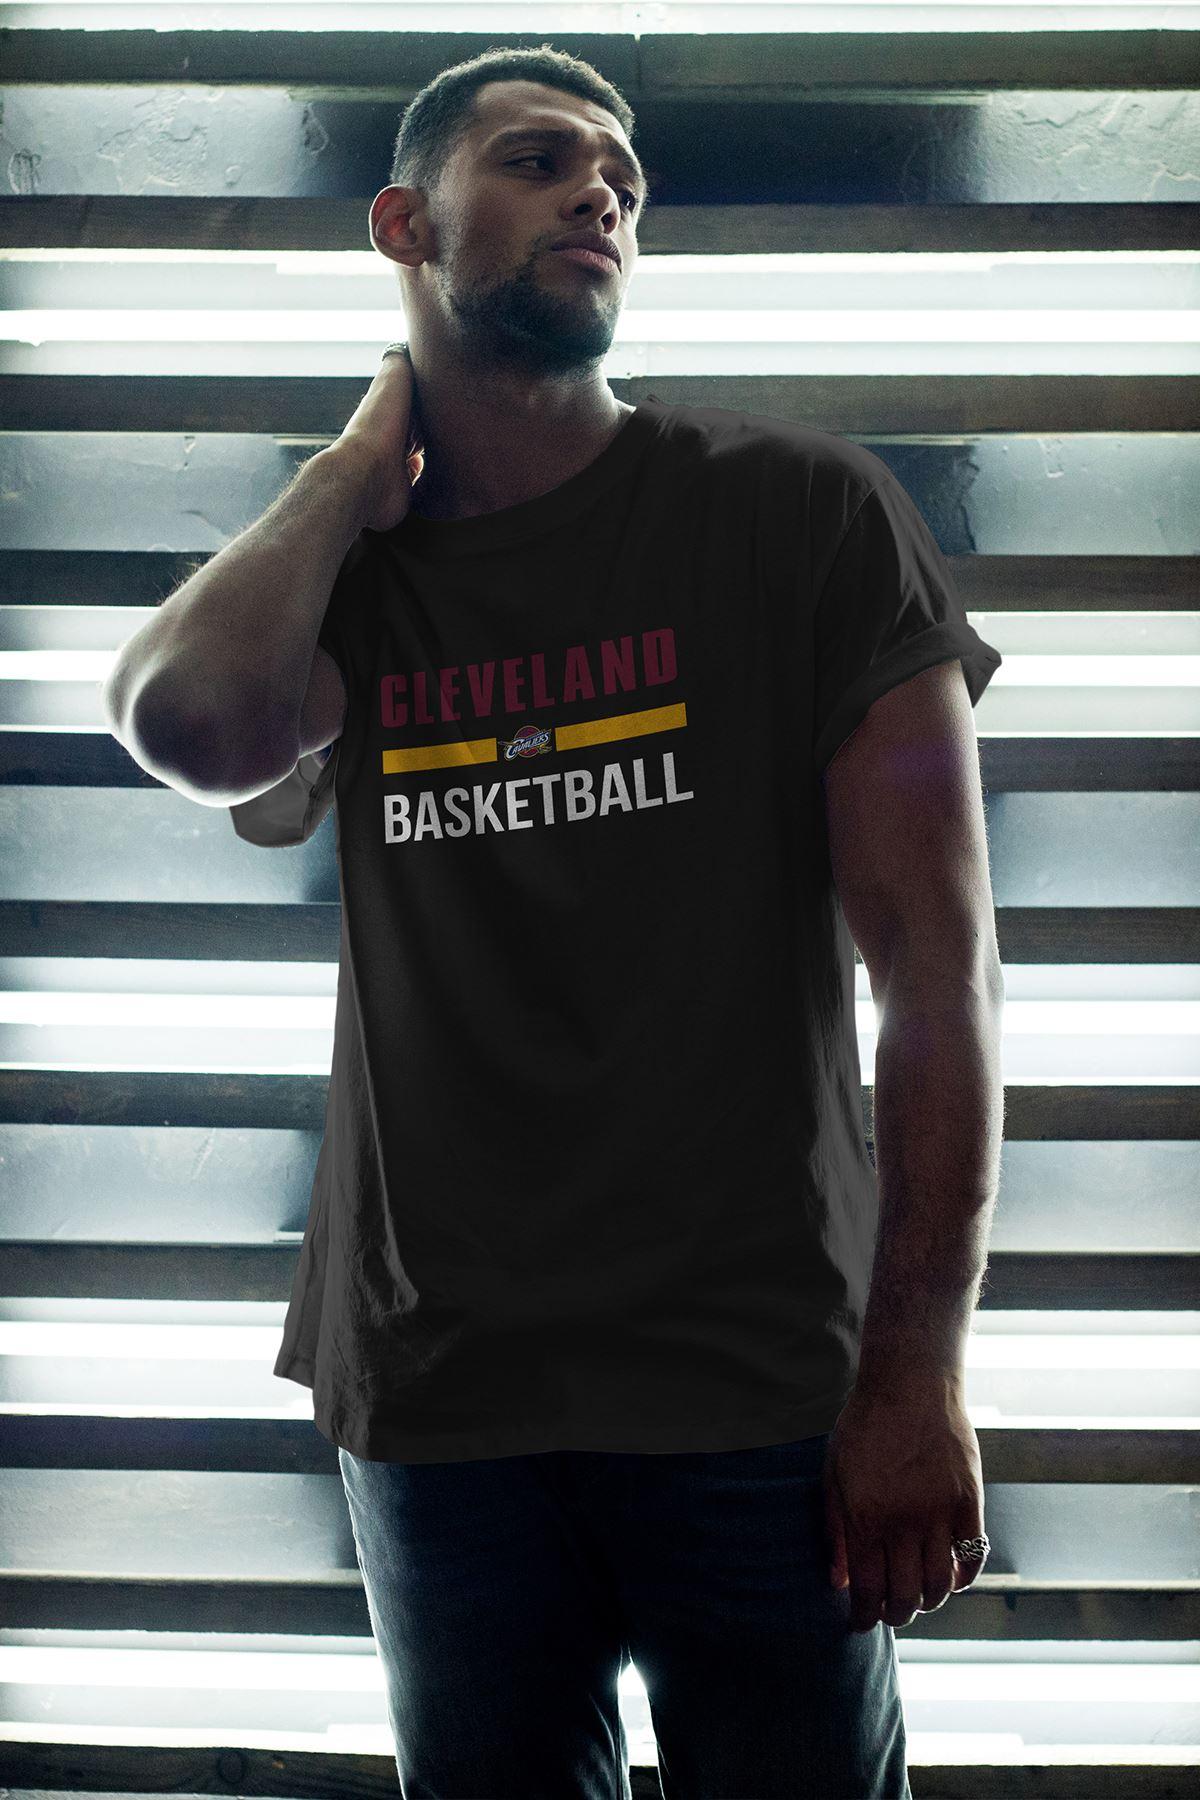 Cleveland 05 Siyah Erkek Oversize Tshirt - Tişört